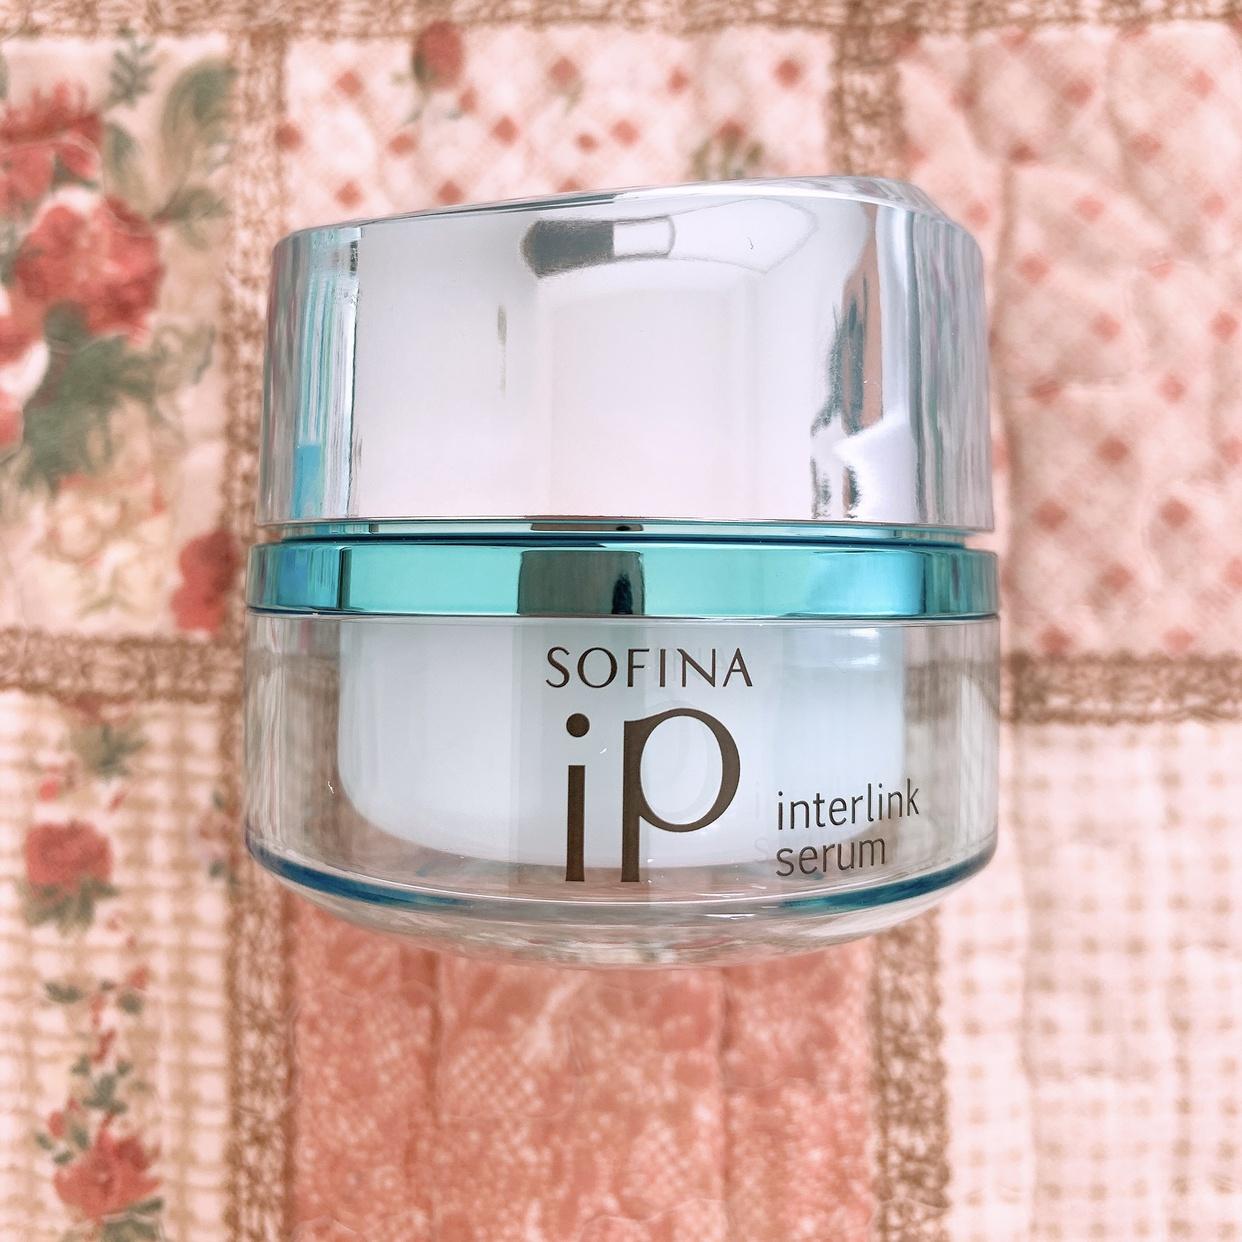 SOFINA  iP(ソフィーナ アイピー) インターリンクセラム 毛穴の目立たない澄んだうるおい肌へを使ったまりたそさんのクチコミ画像2